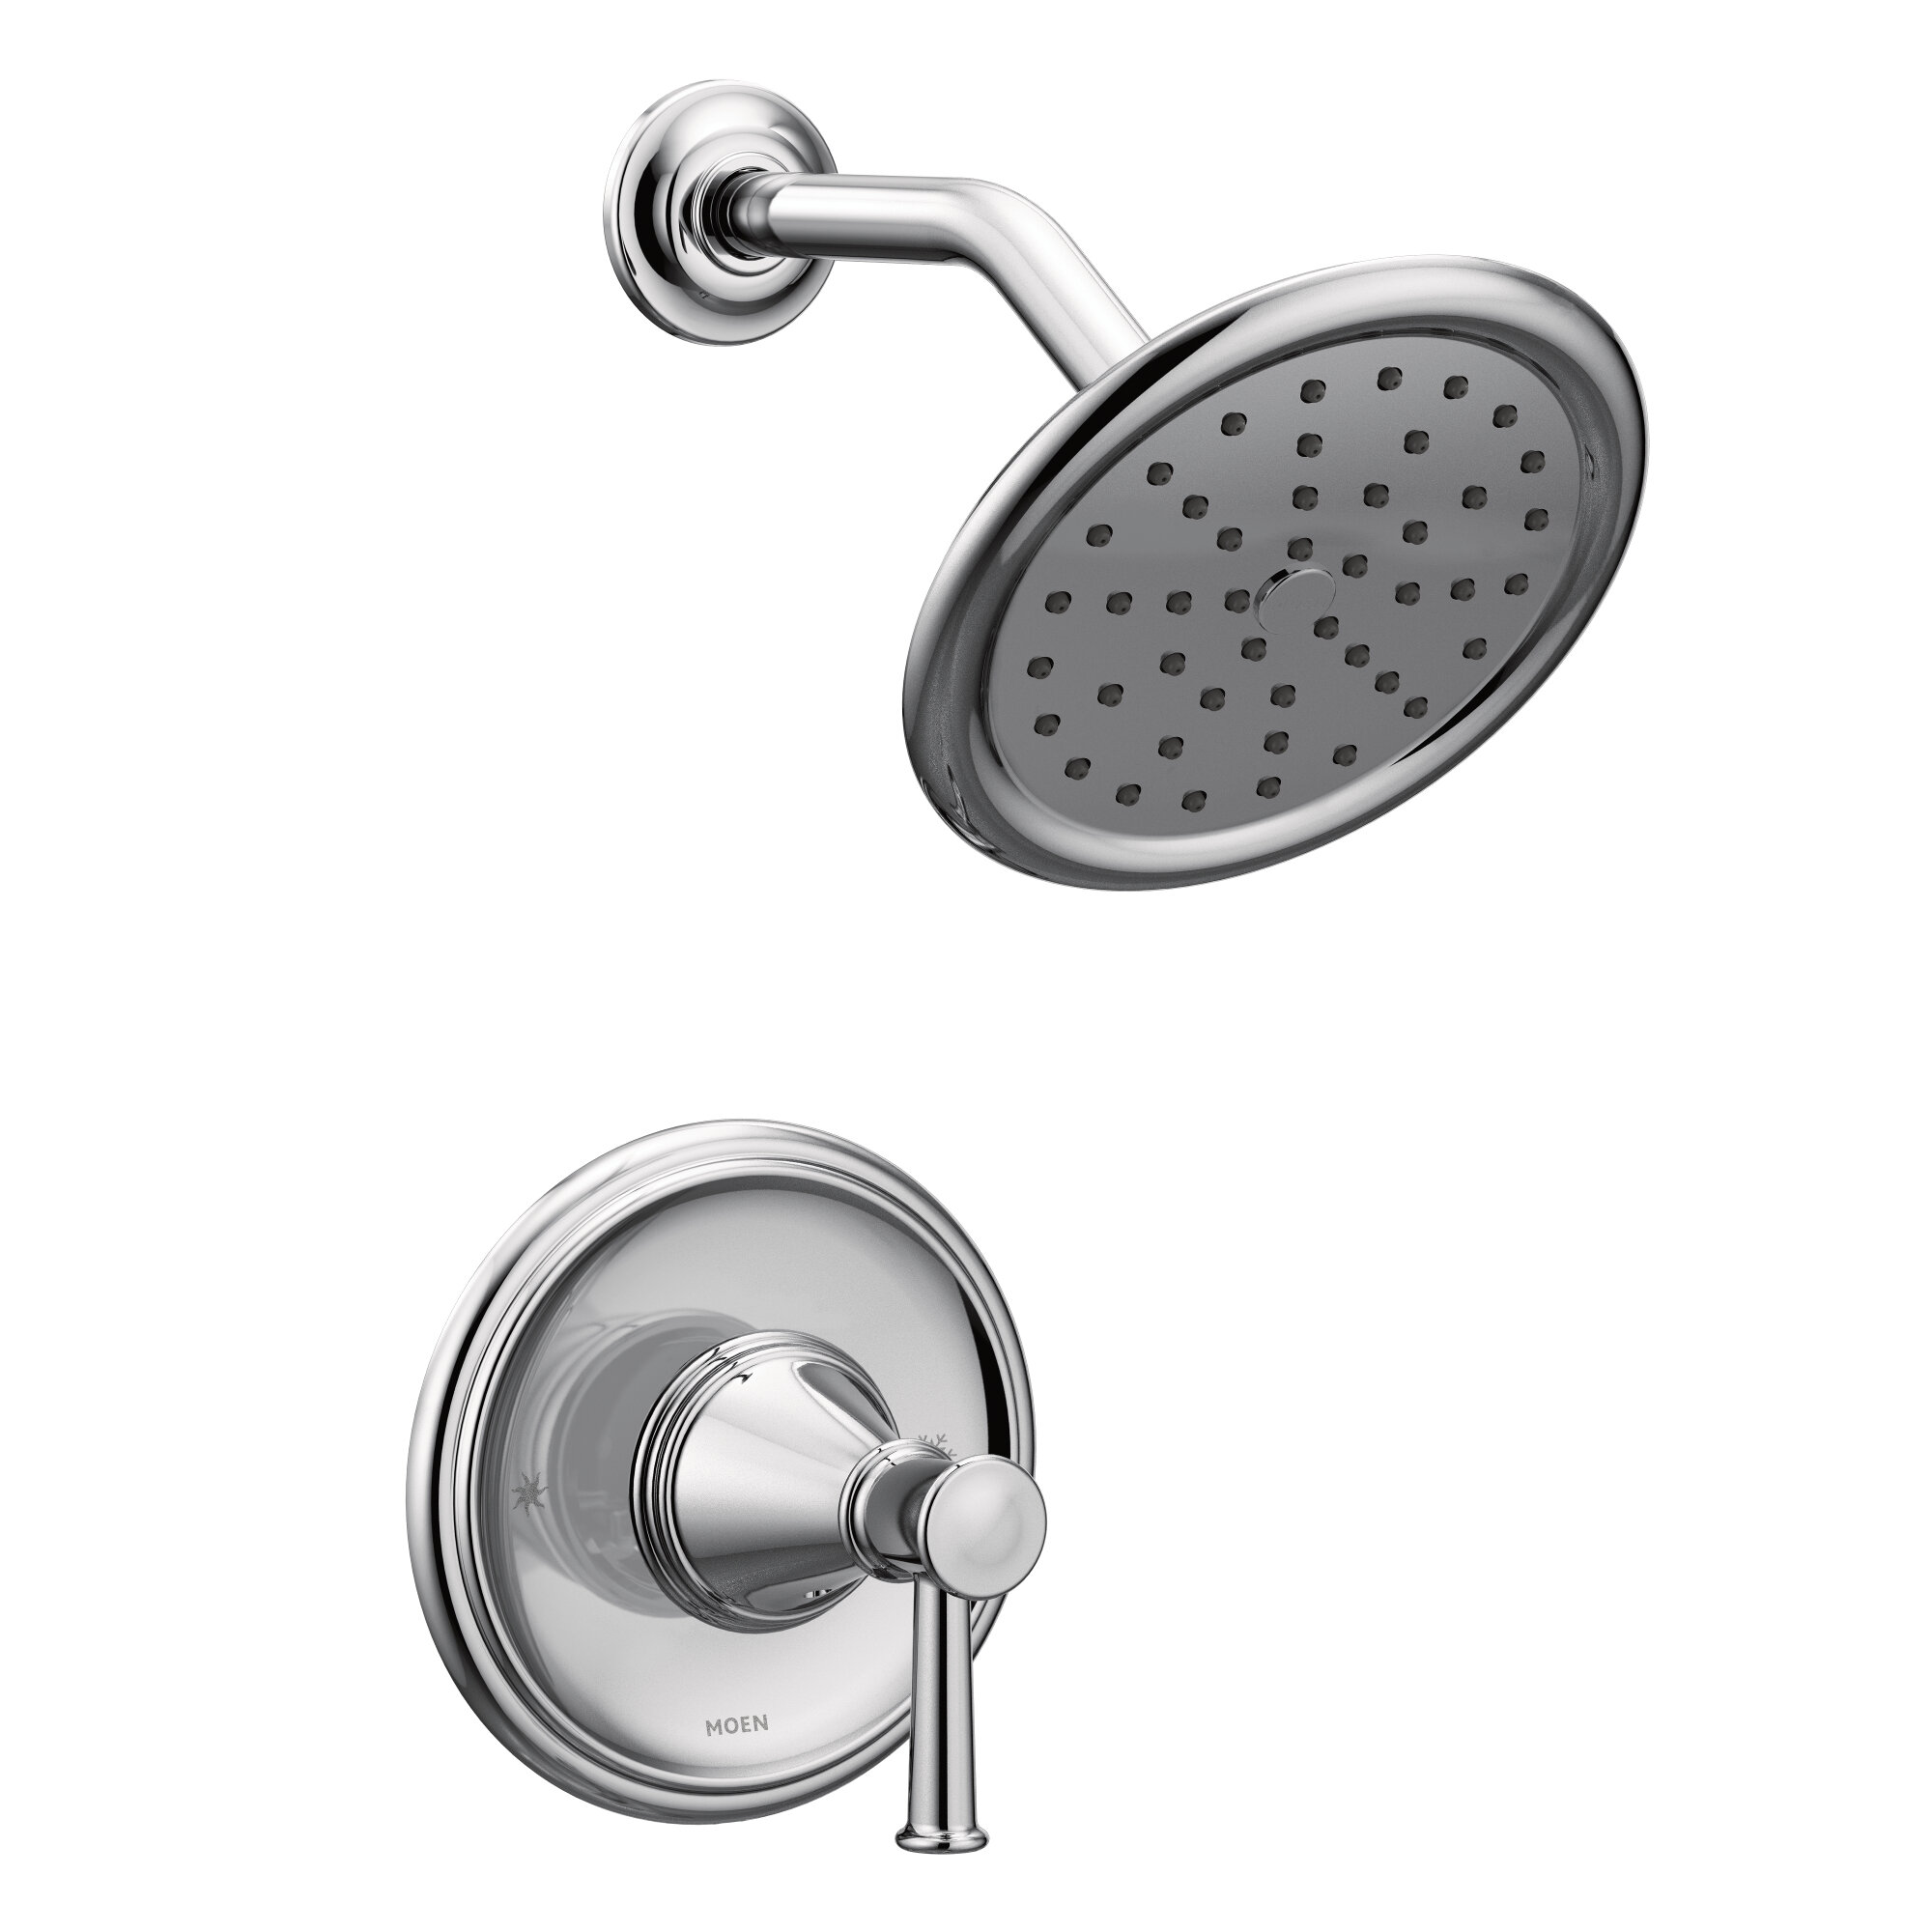 Moen Belfield Shower Faucet With Lever Handle And Posi Temp Reviews Wayfair